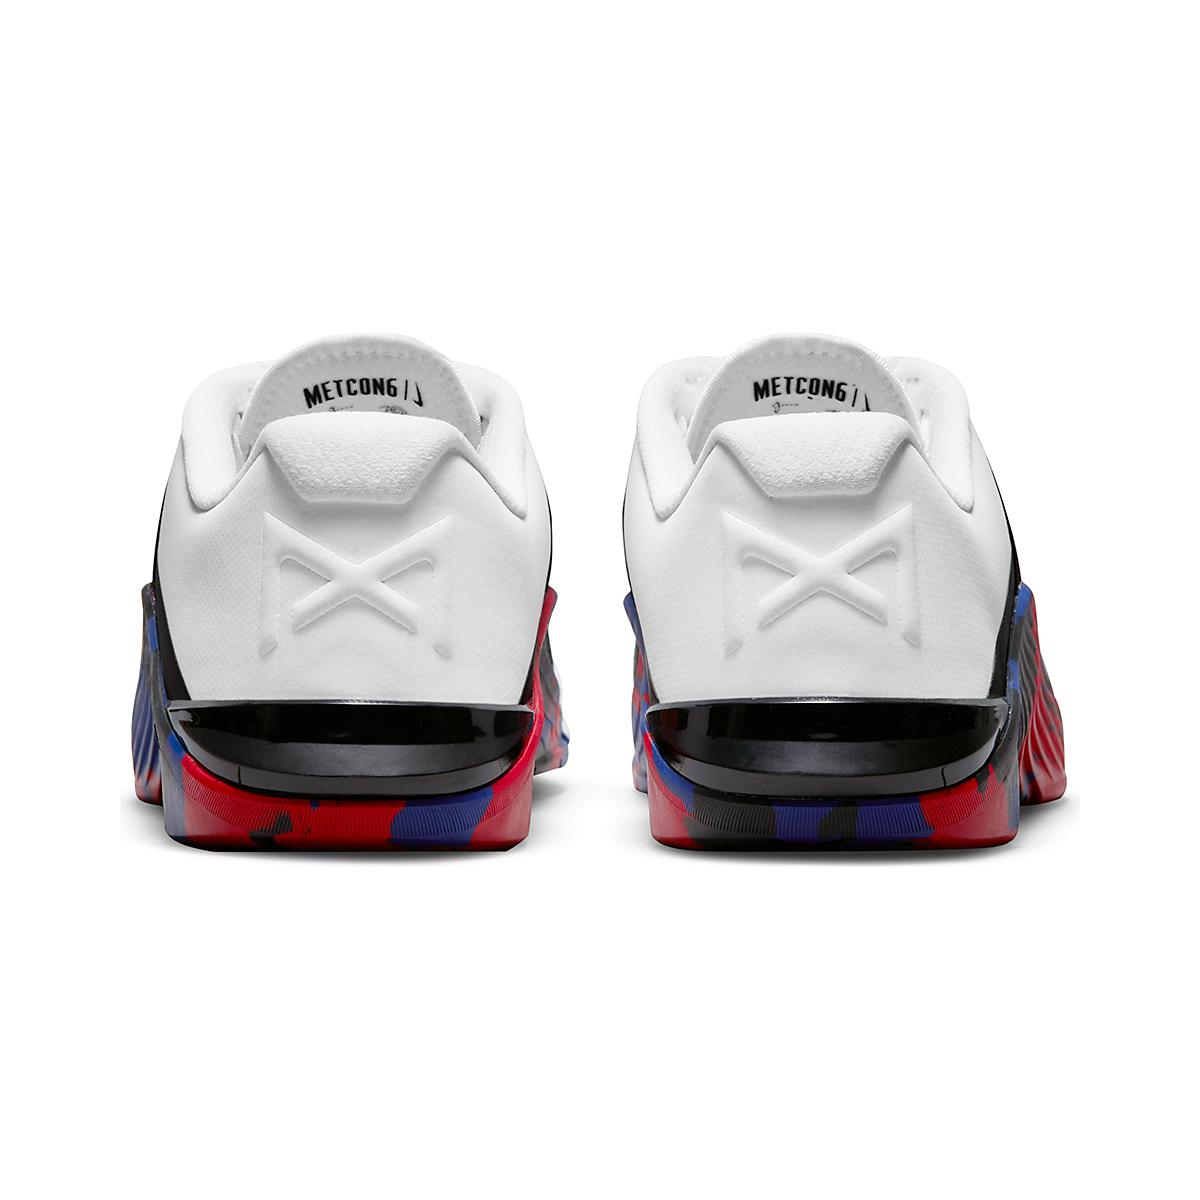 Men's Nike Metcon 6 Training Shoe - Color: White/Black/Gym Red/Deep Royal Blue - Size: 4 - Width: Regular, White/Black/Gym Red/Deep Royal Blue, large, image 5